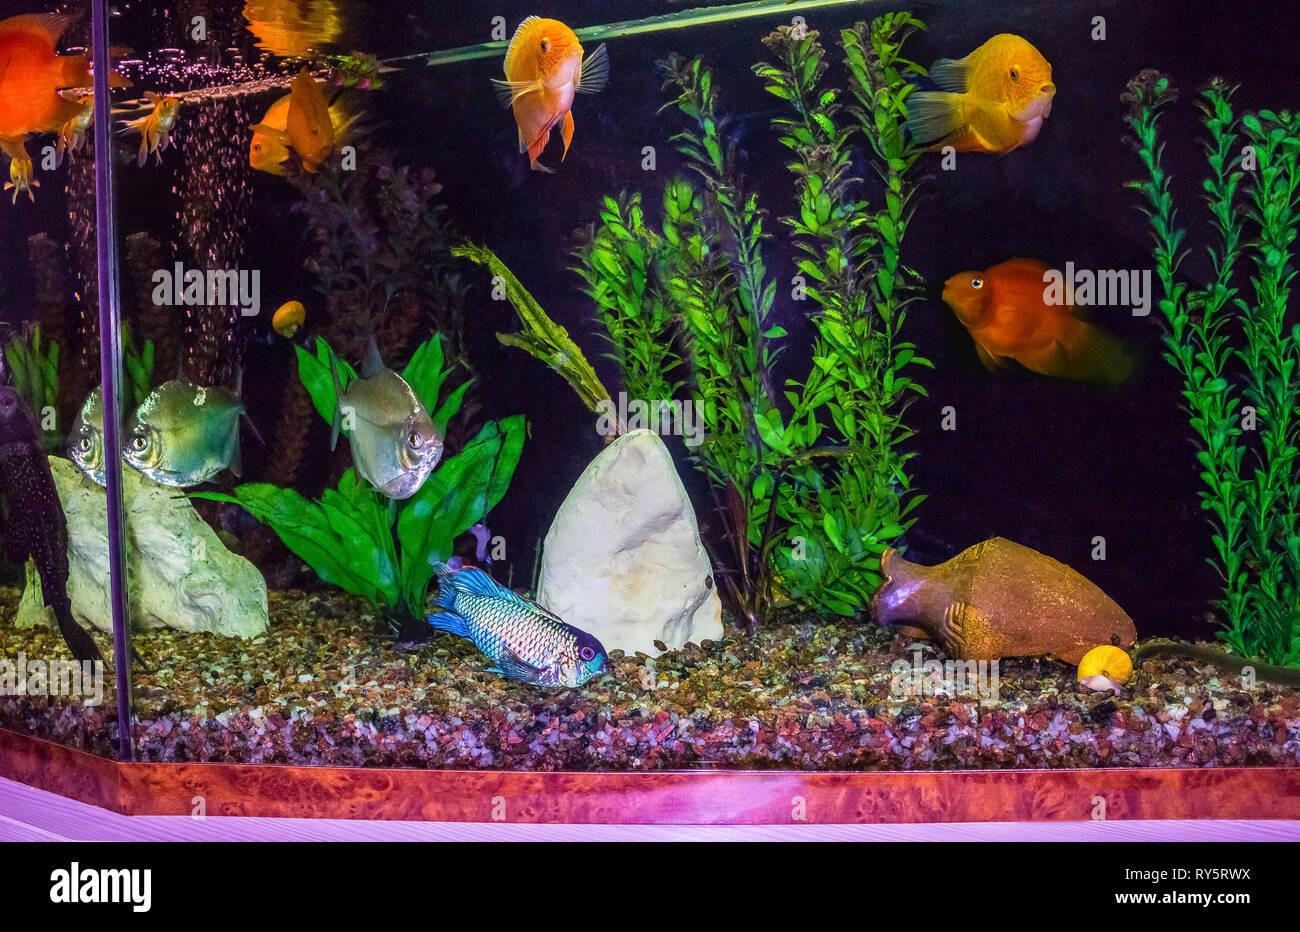 close up of aquarium tank full of fish - Stock Image